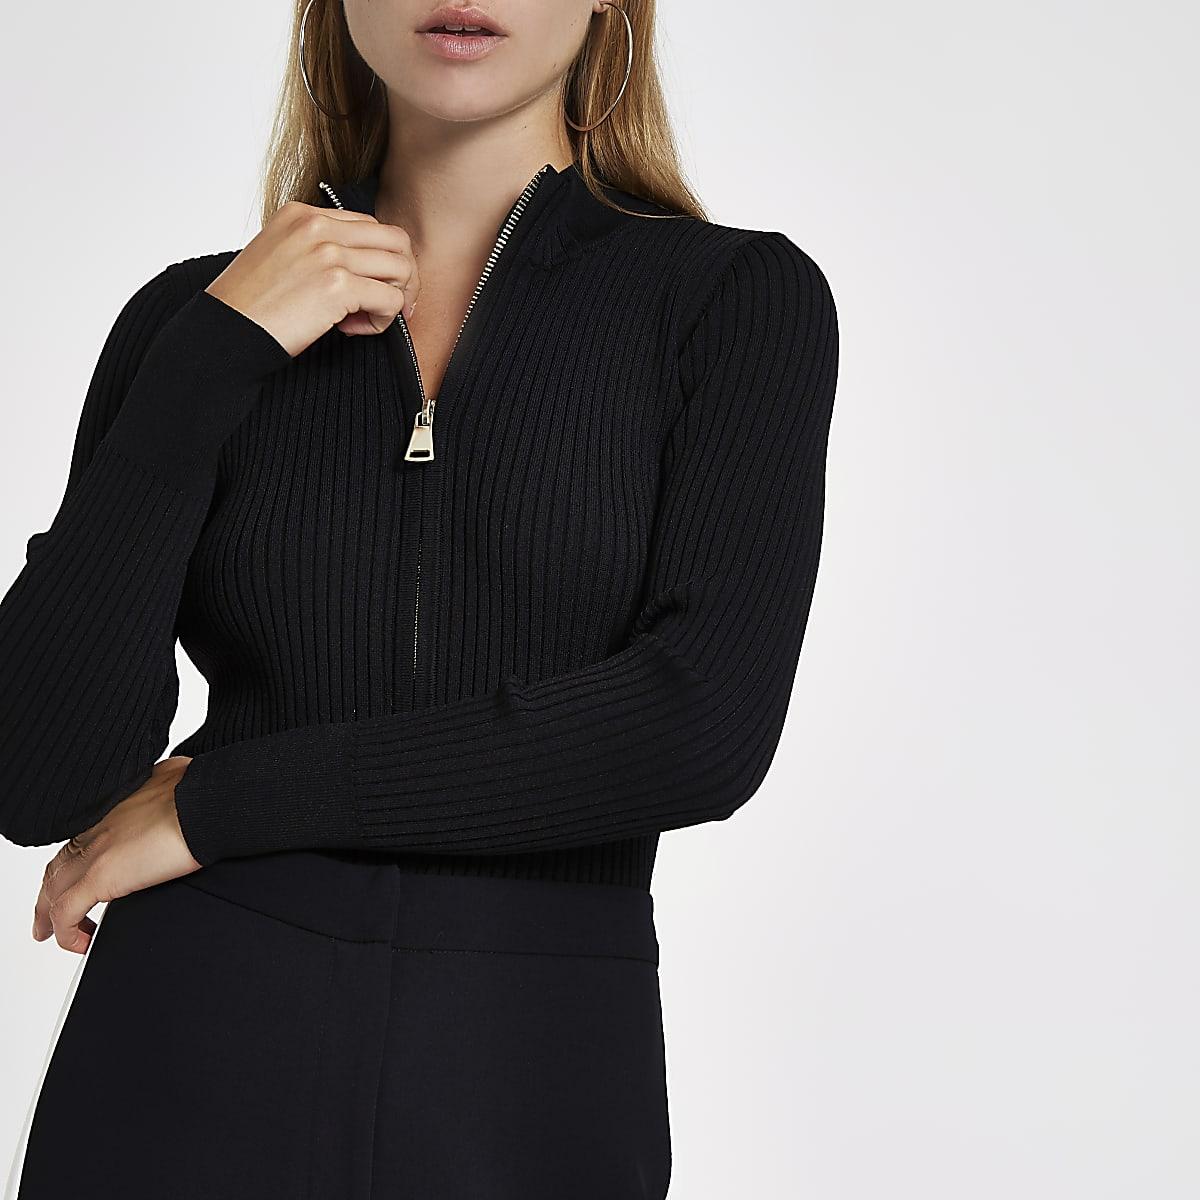 82c78caef51b5 Black knit rib zip through top - Knit Tops - Knitwear - women